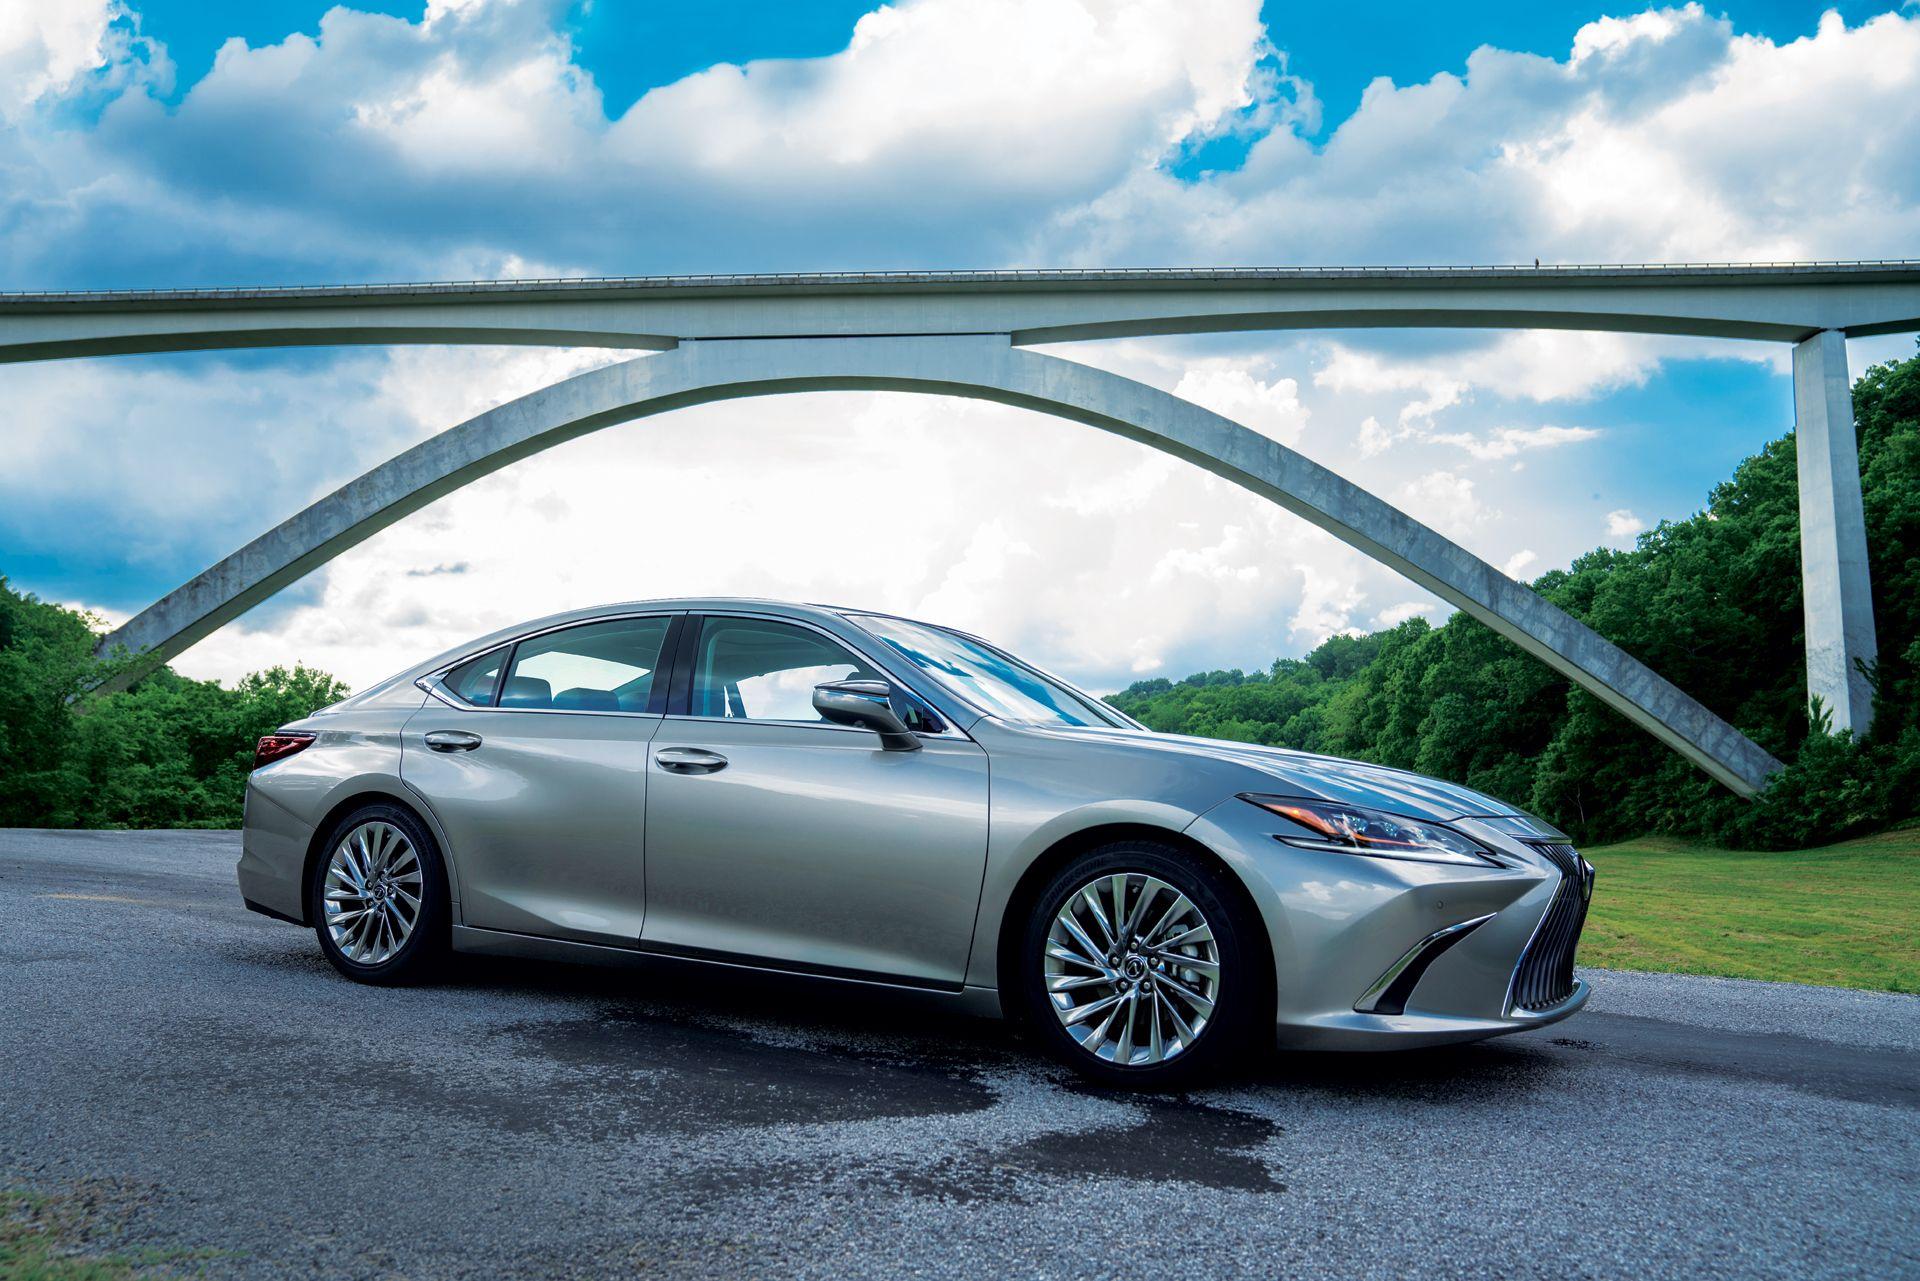 Lexus ES: The Spirit Of Omotenashi